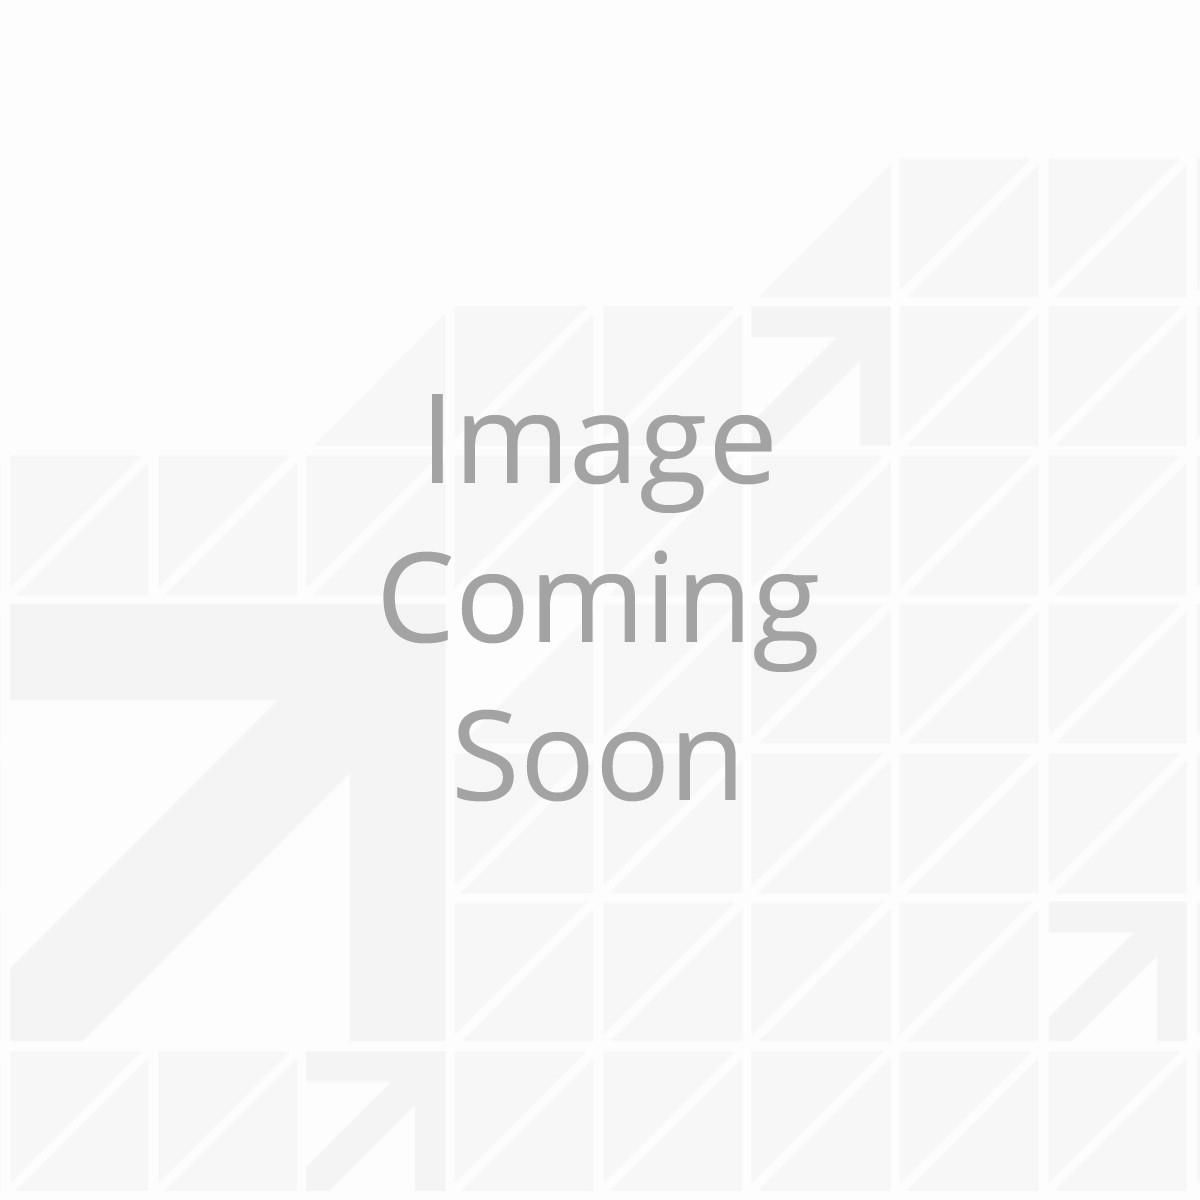 5121 ALPHATHANE 100% Solids Self-Leveling Sealant, Gray (9.8 Oz. Tube)